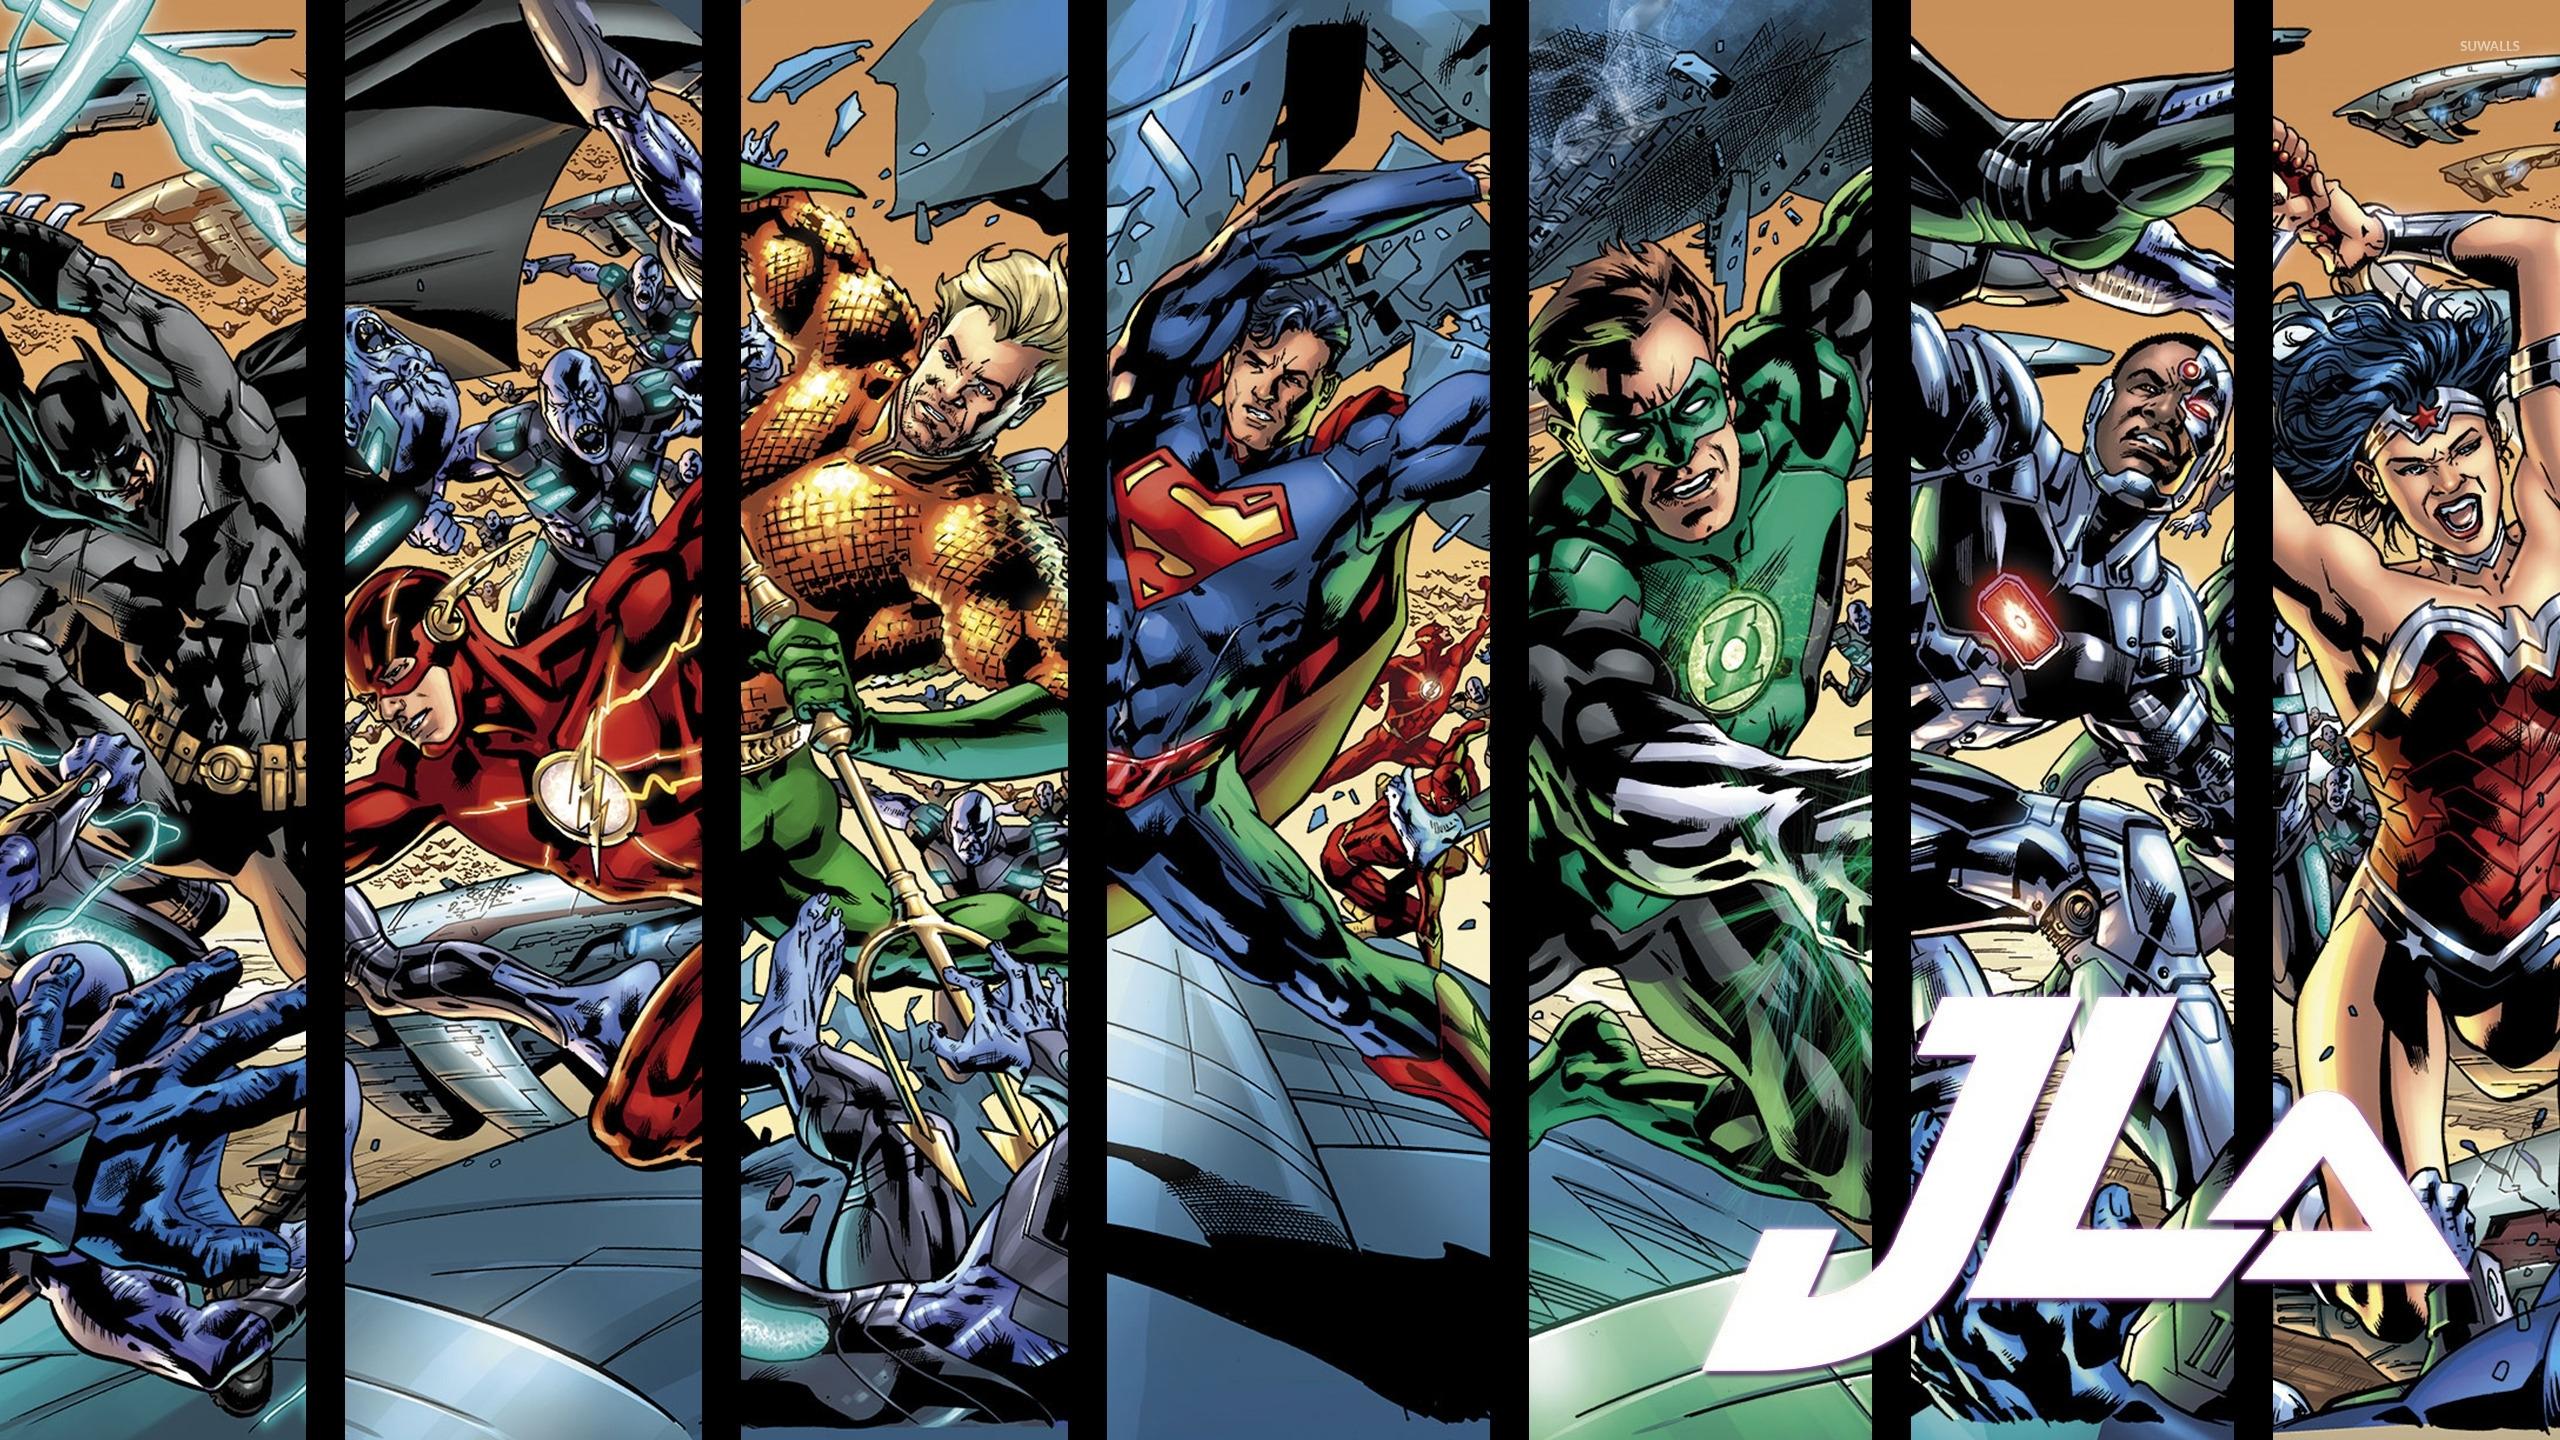 Title 696 Justice League New 52 Wallpaper Dimension 2560 X 1440 File Type JPG JPEG